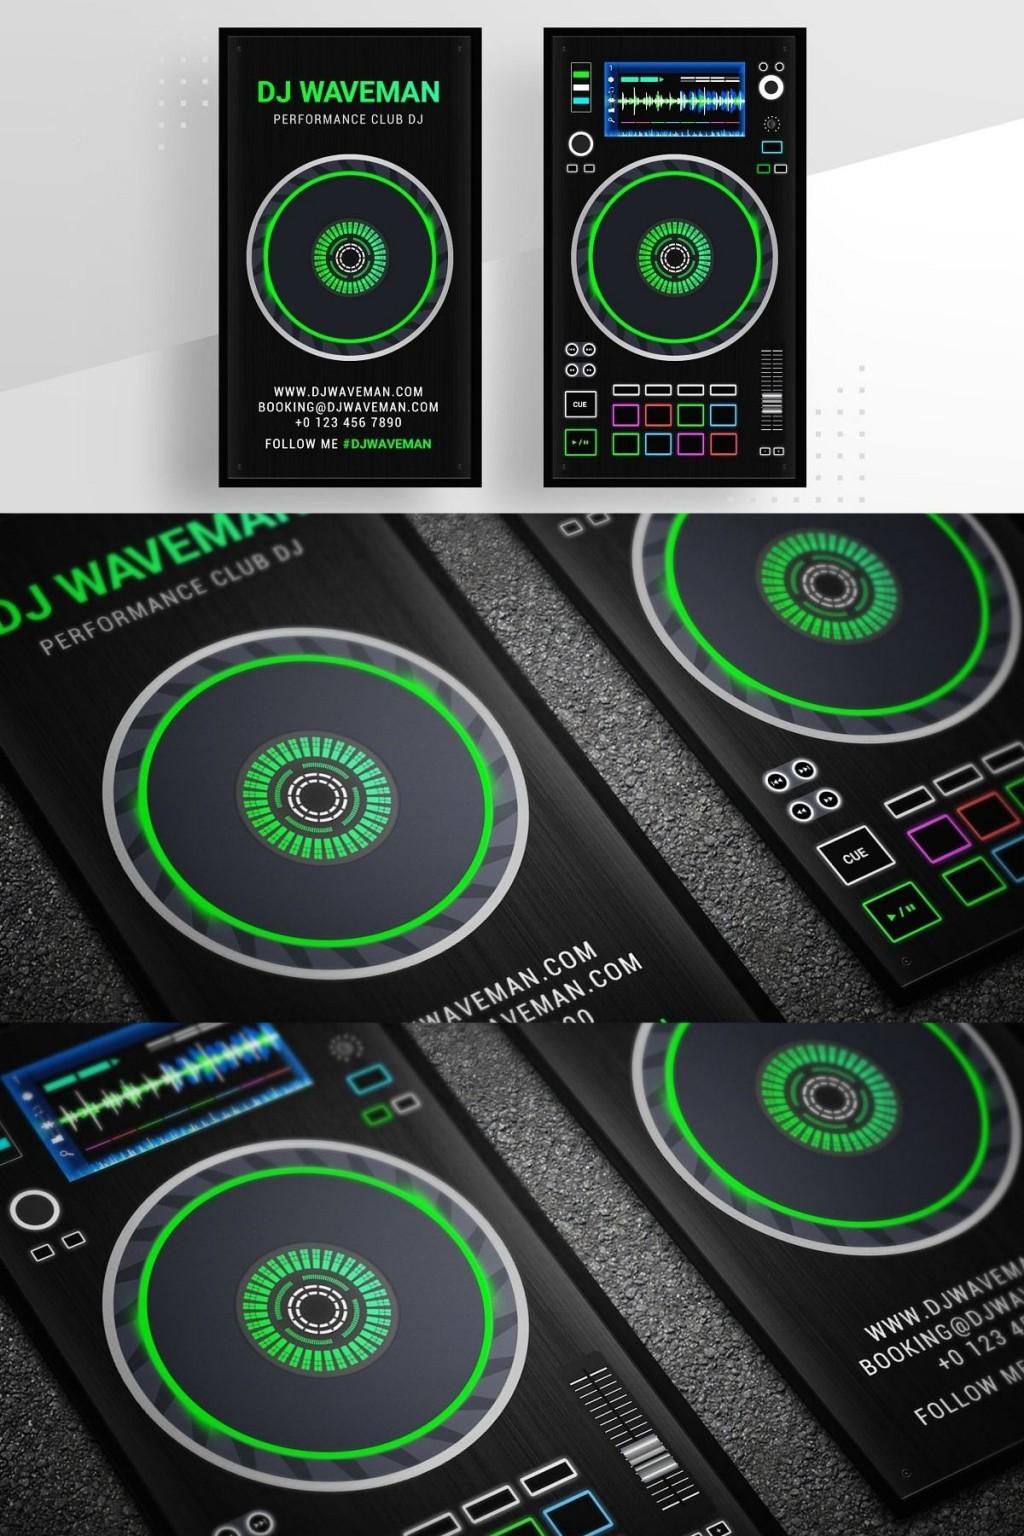 002 Remarkable Dj Busines Card Template High Resolution  Psd Free DownloadLarge